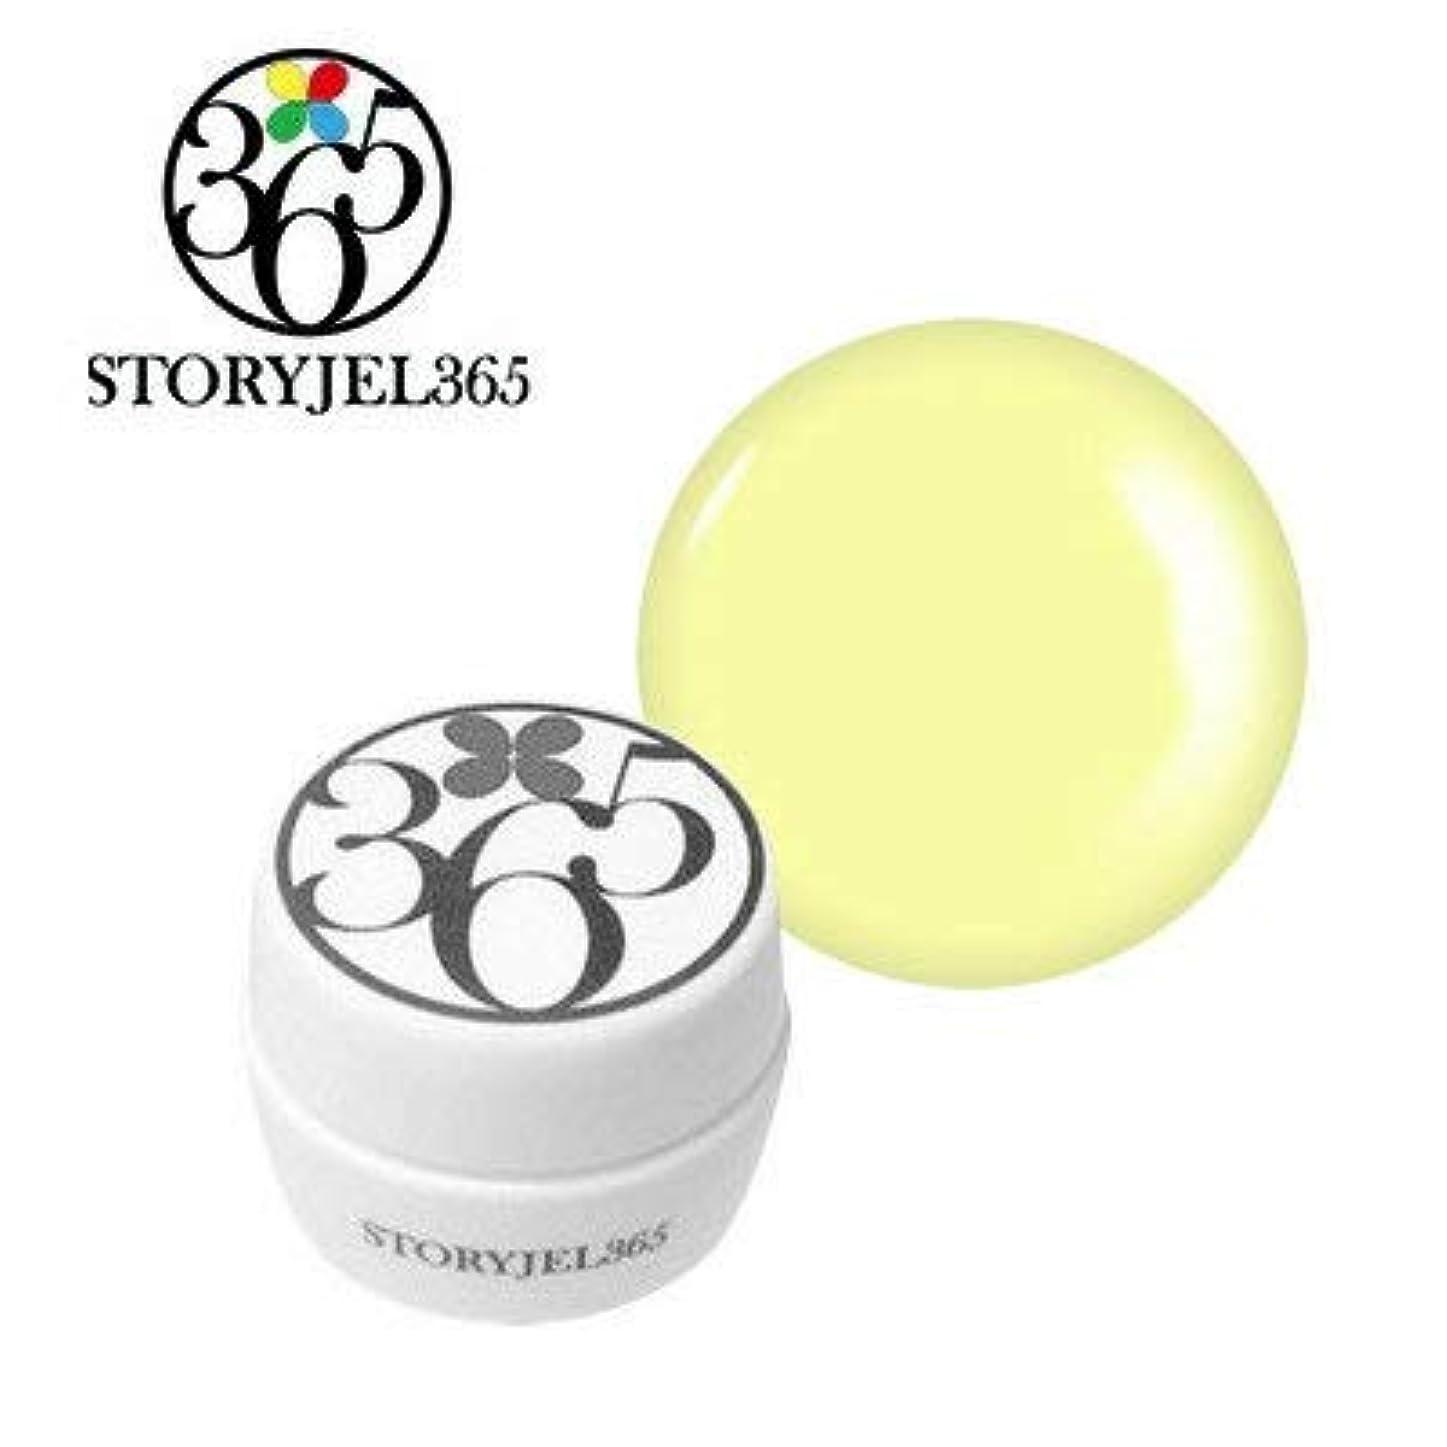 STORYJEL365 カラージェル 5g (ストーリージェル) SJS-303M-D シトロンクリーム